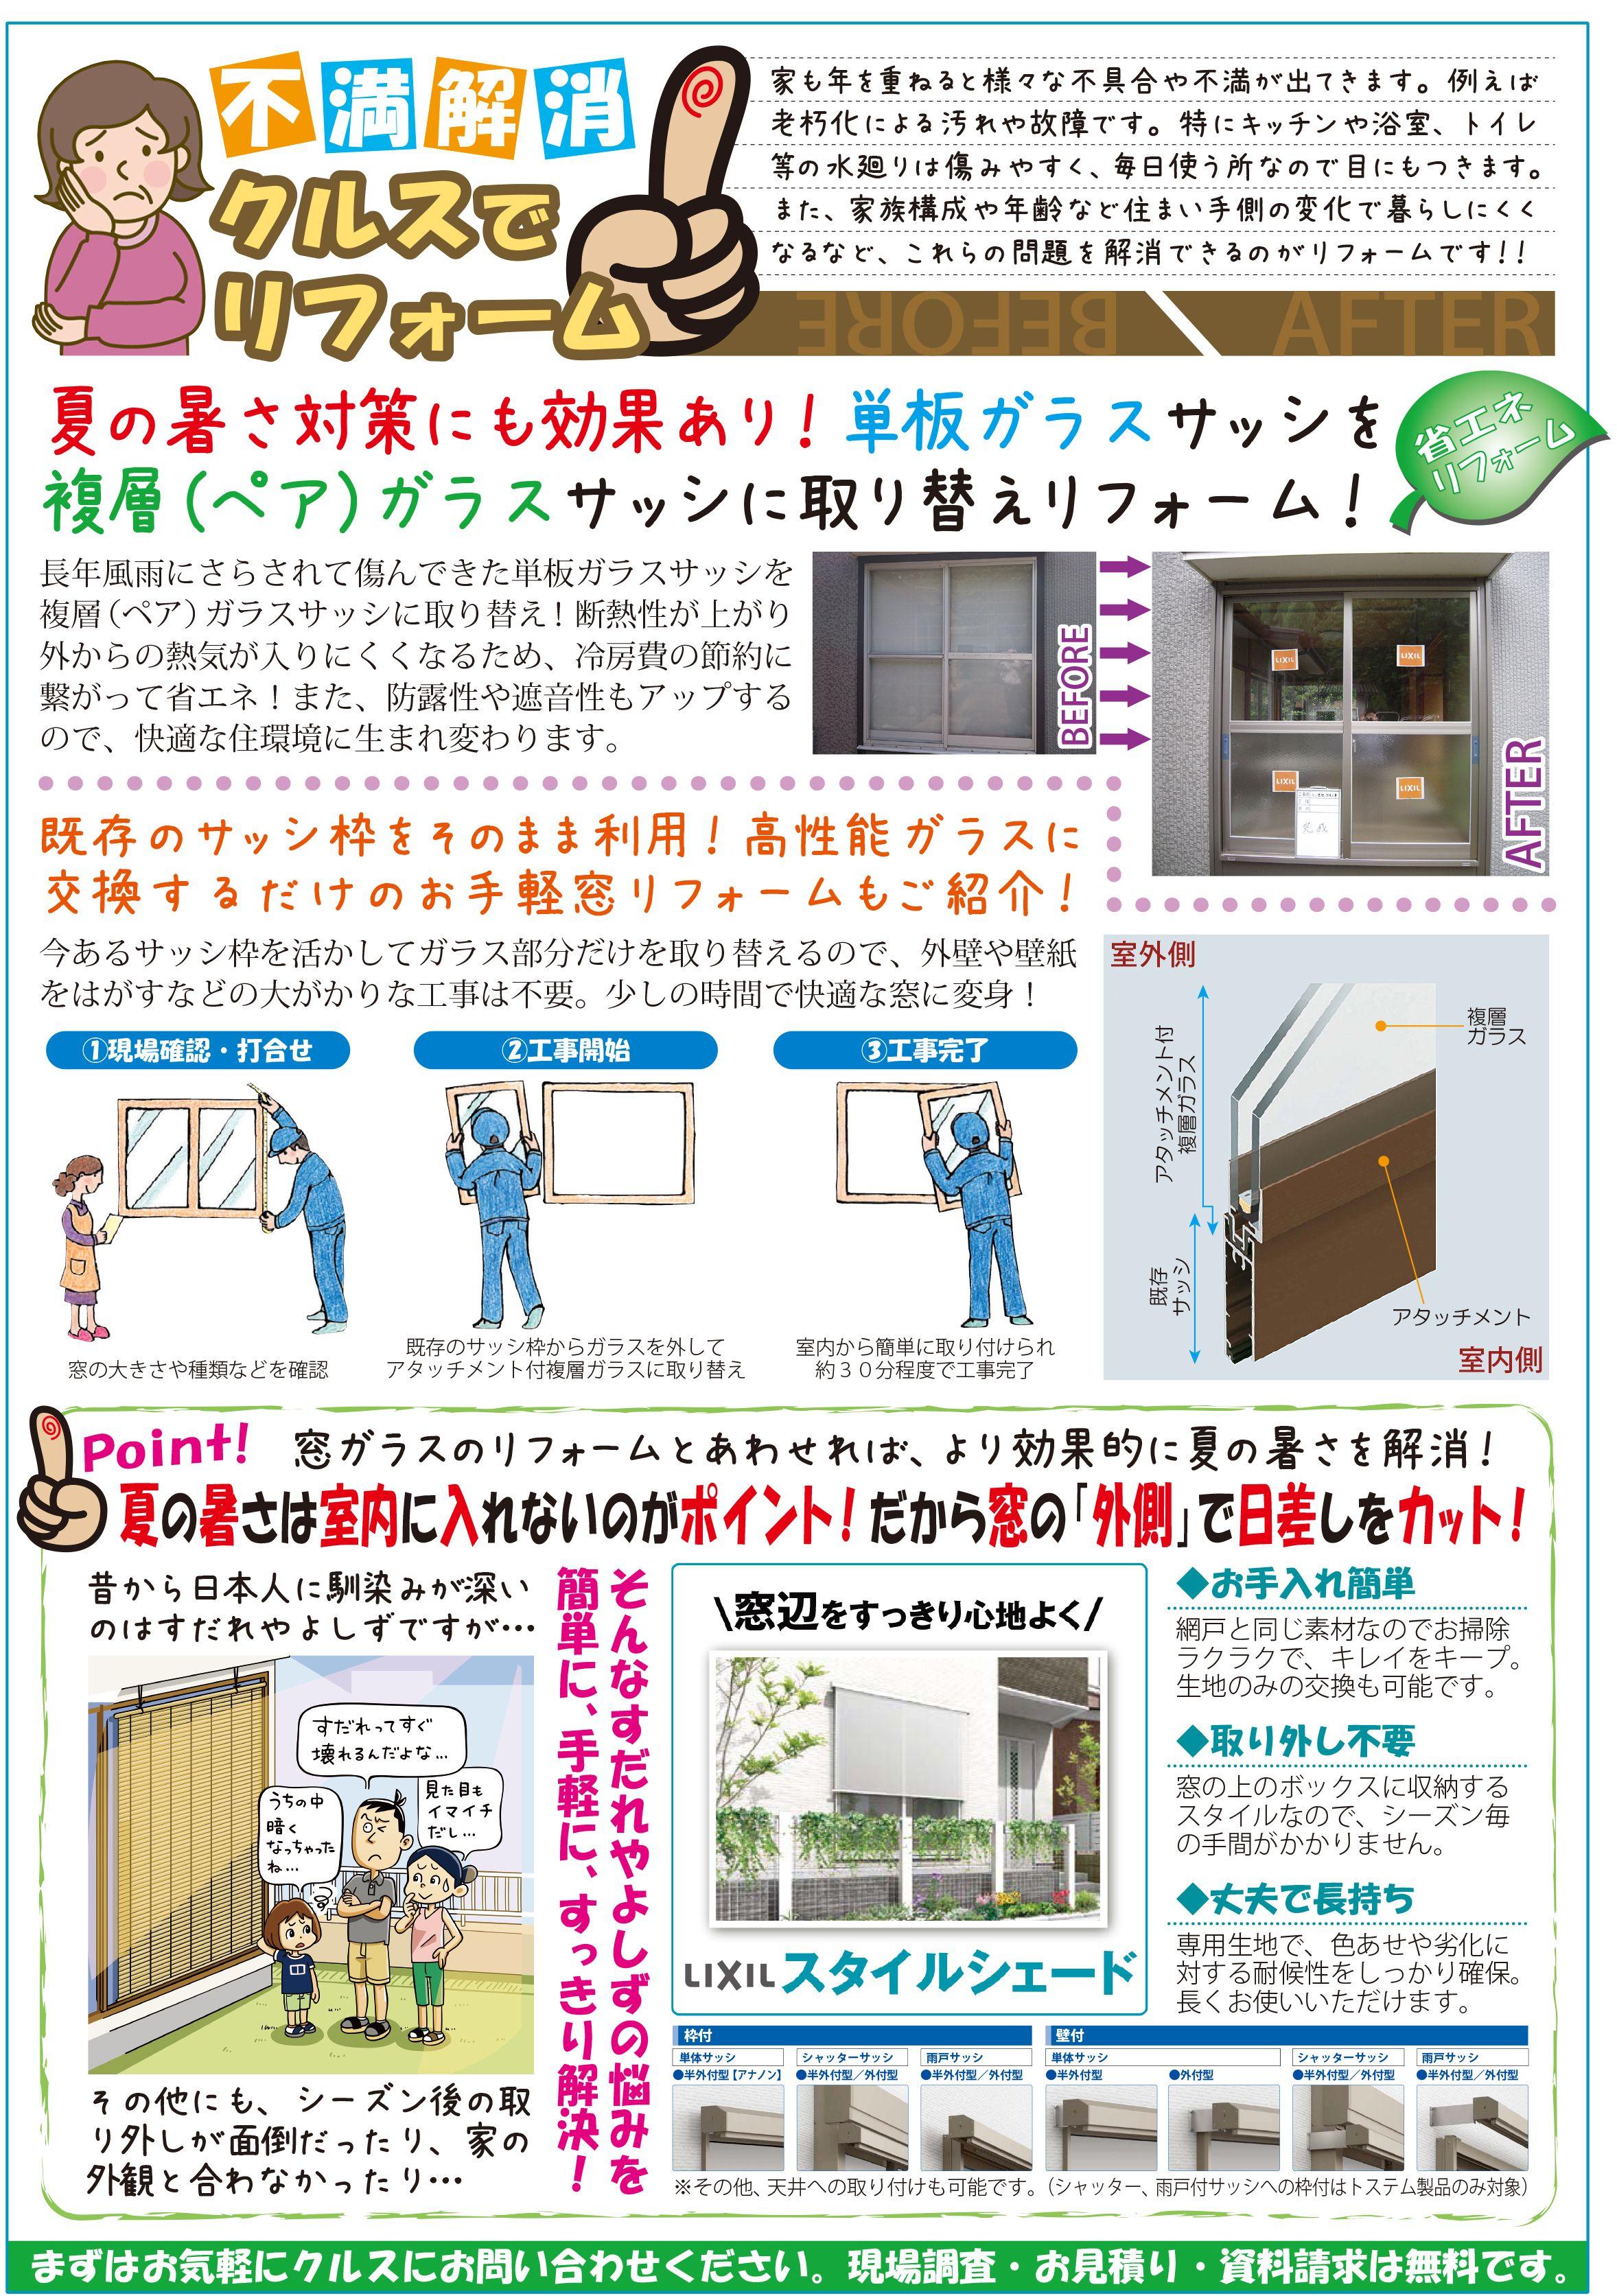 KuraSi-natu-sin100-07.jpg